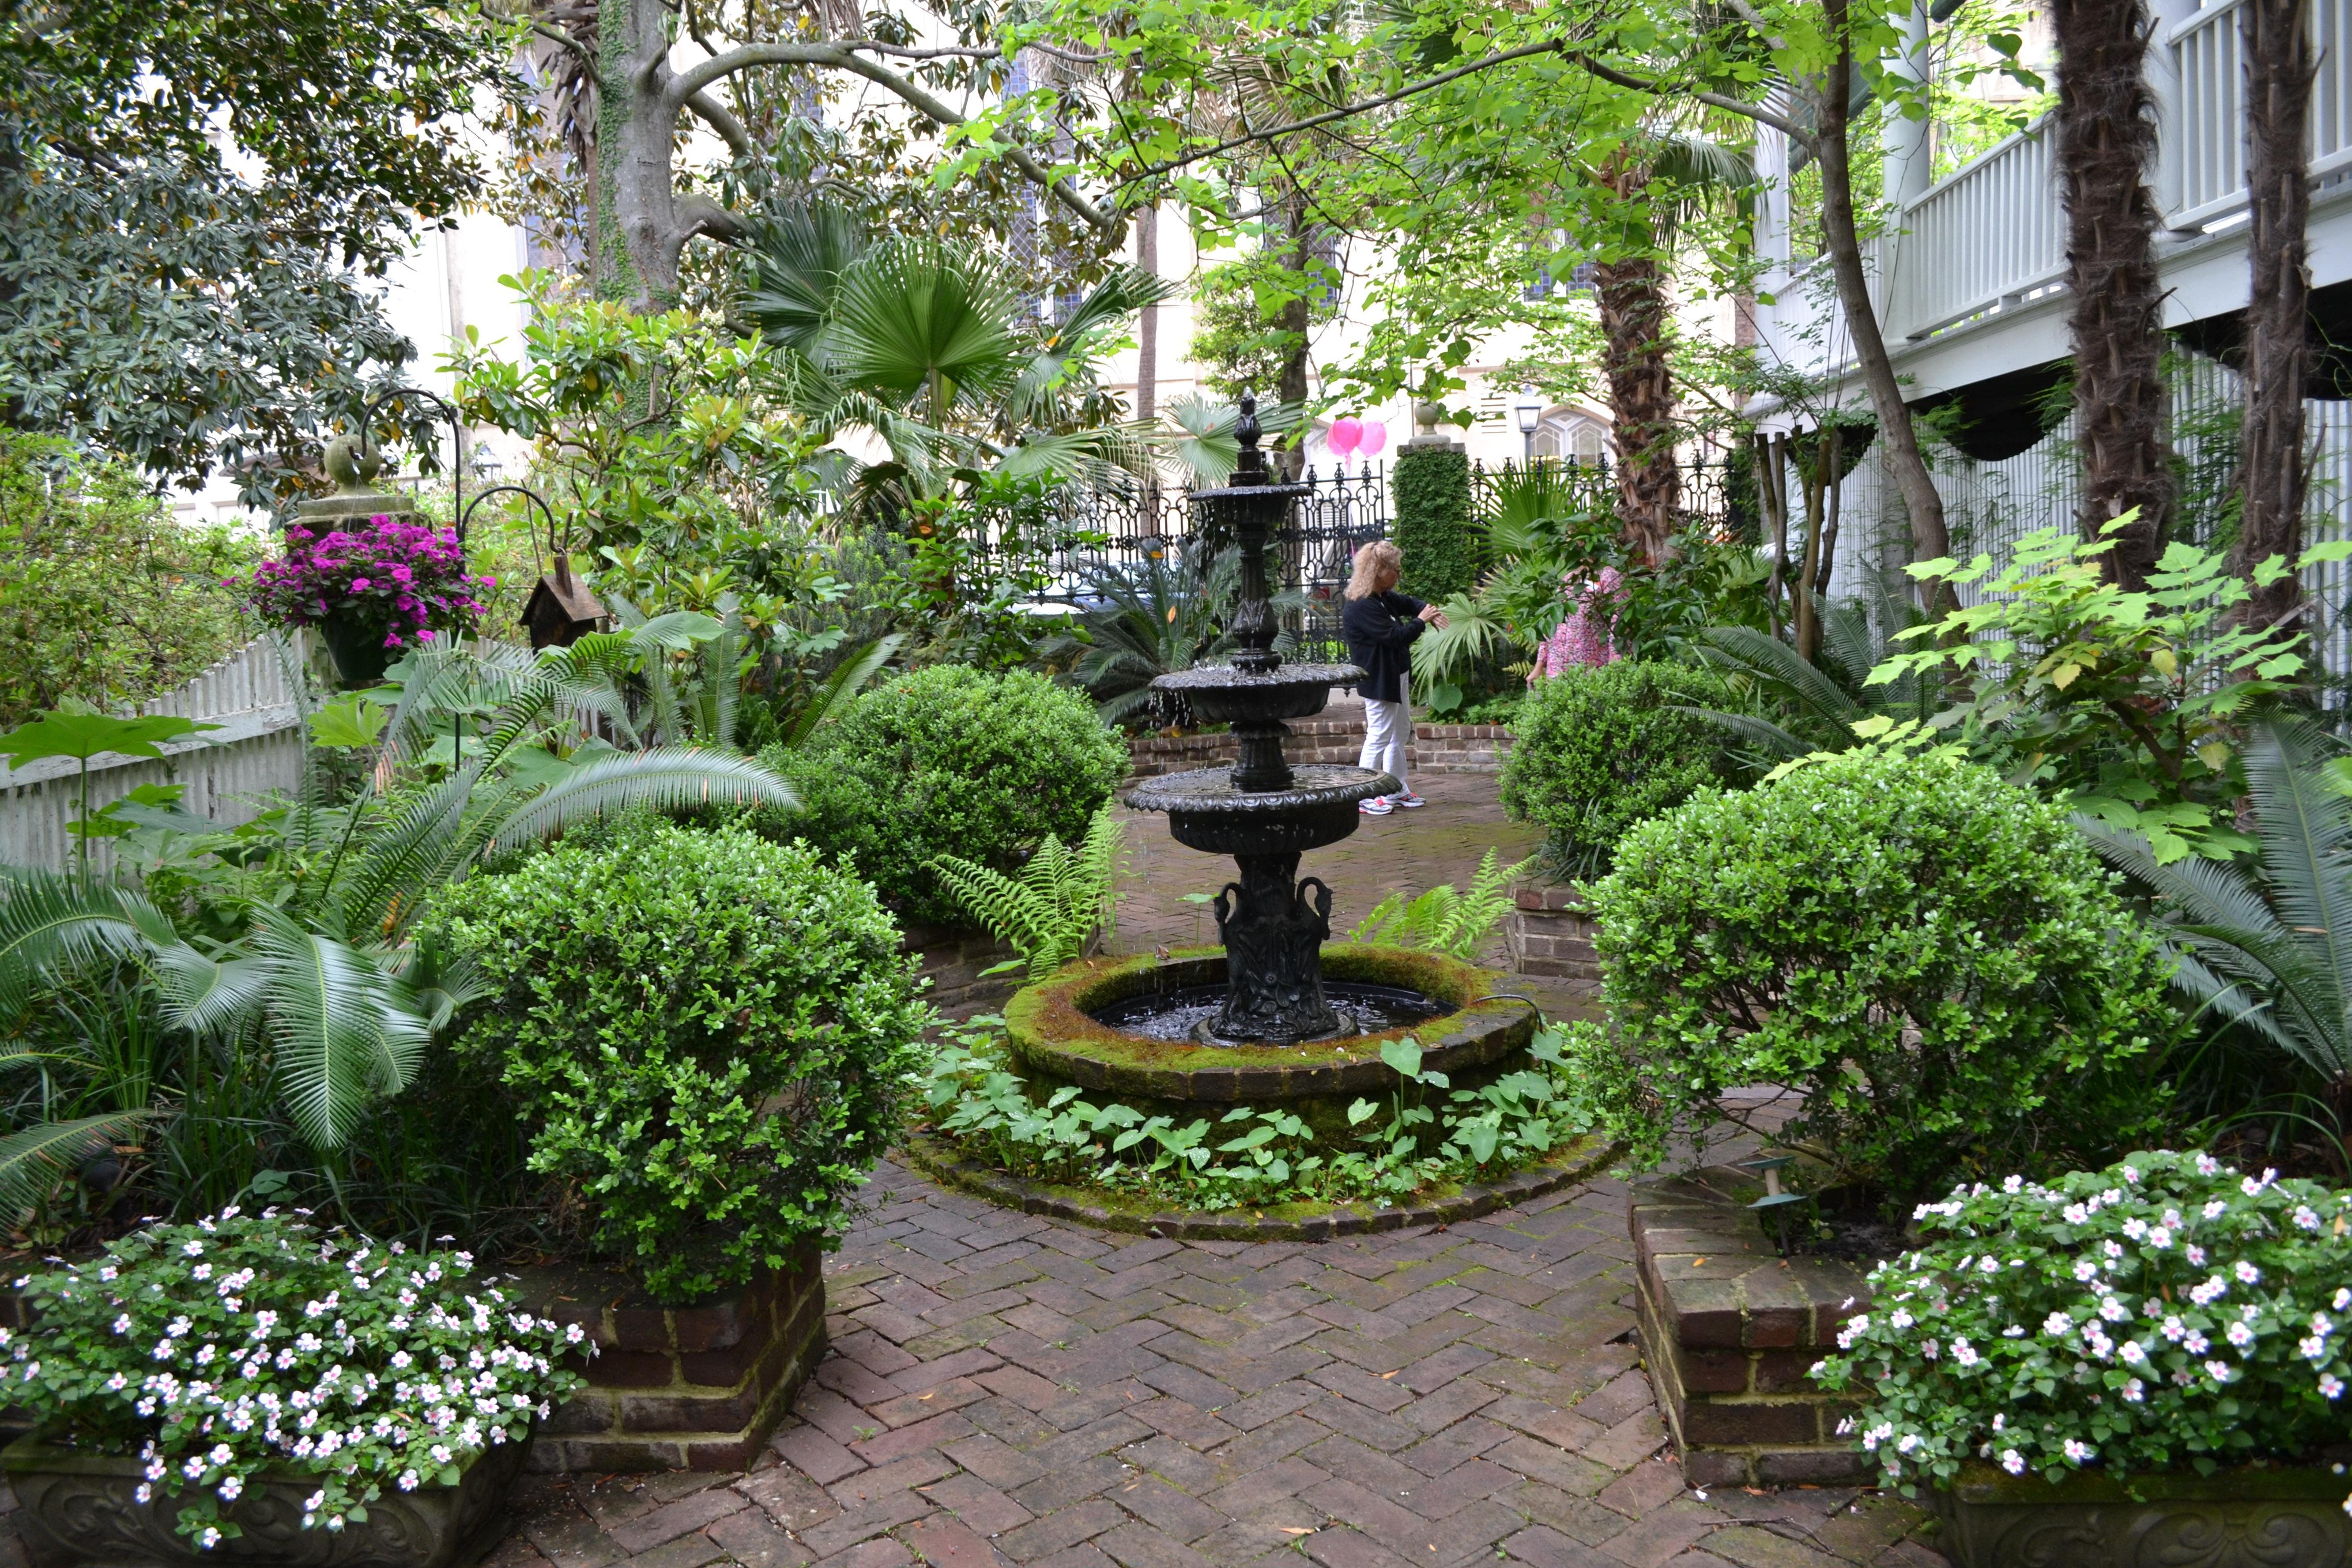 Fotos gratis : flor, paisaje, patio interior, botánica, turismo, del ...